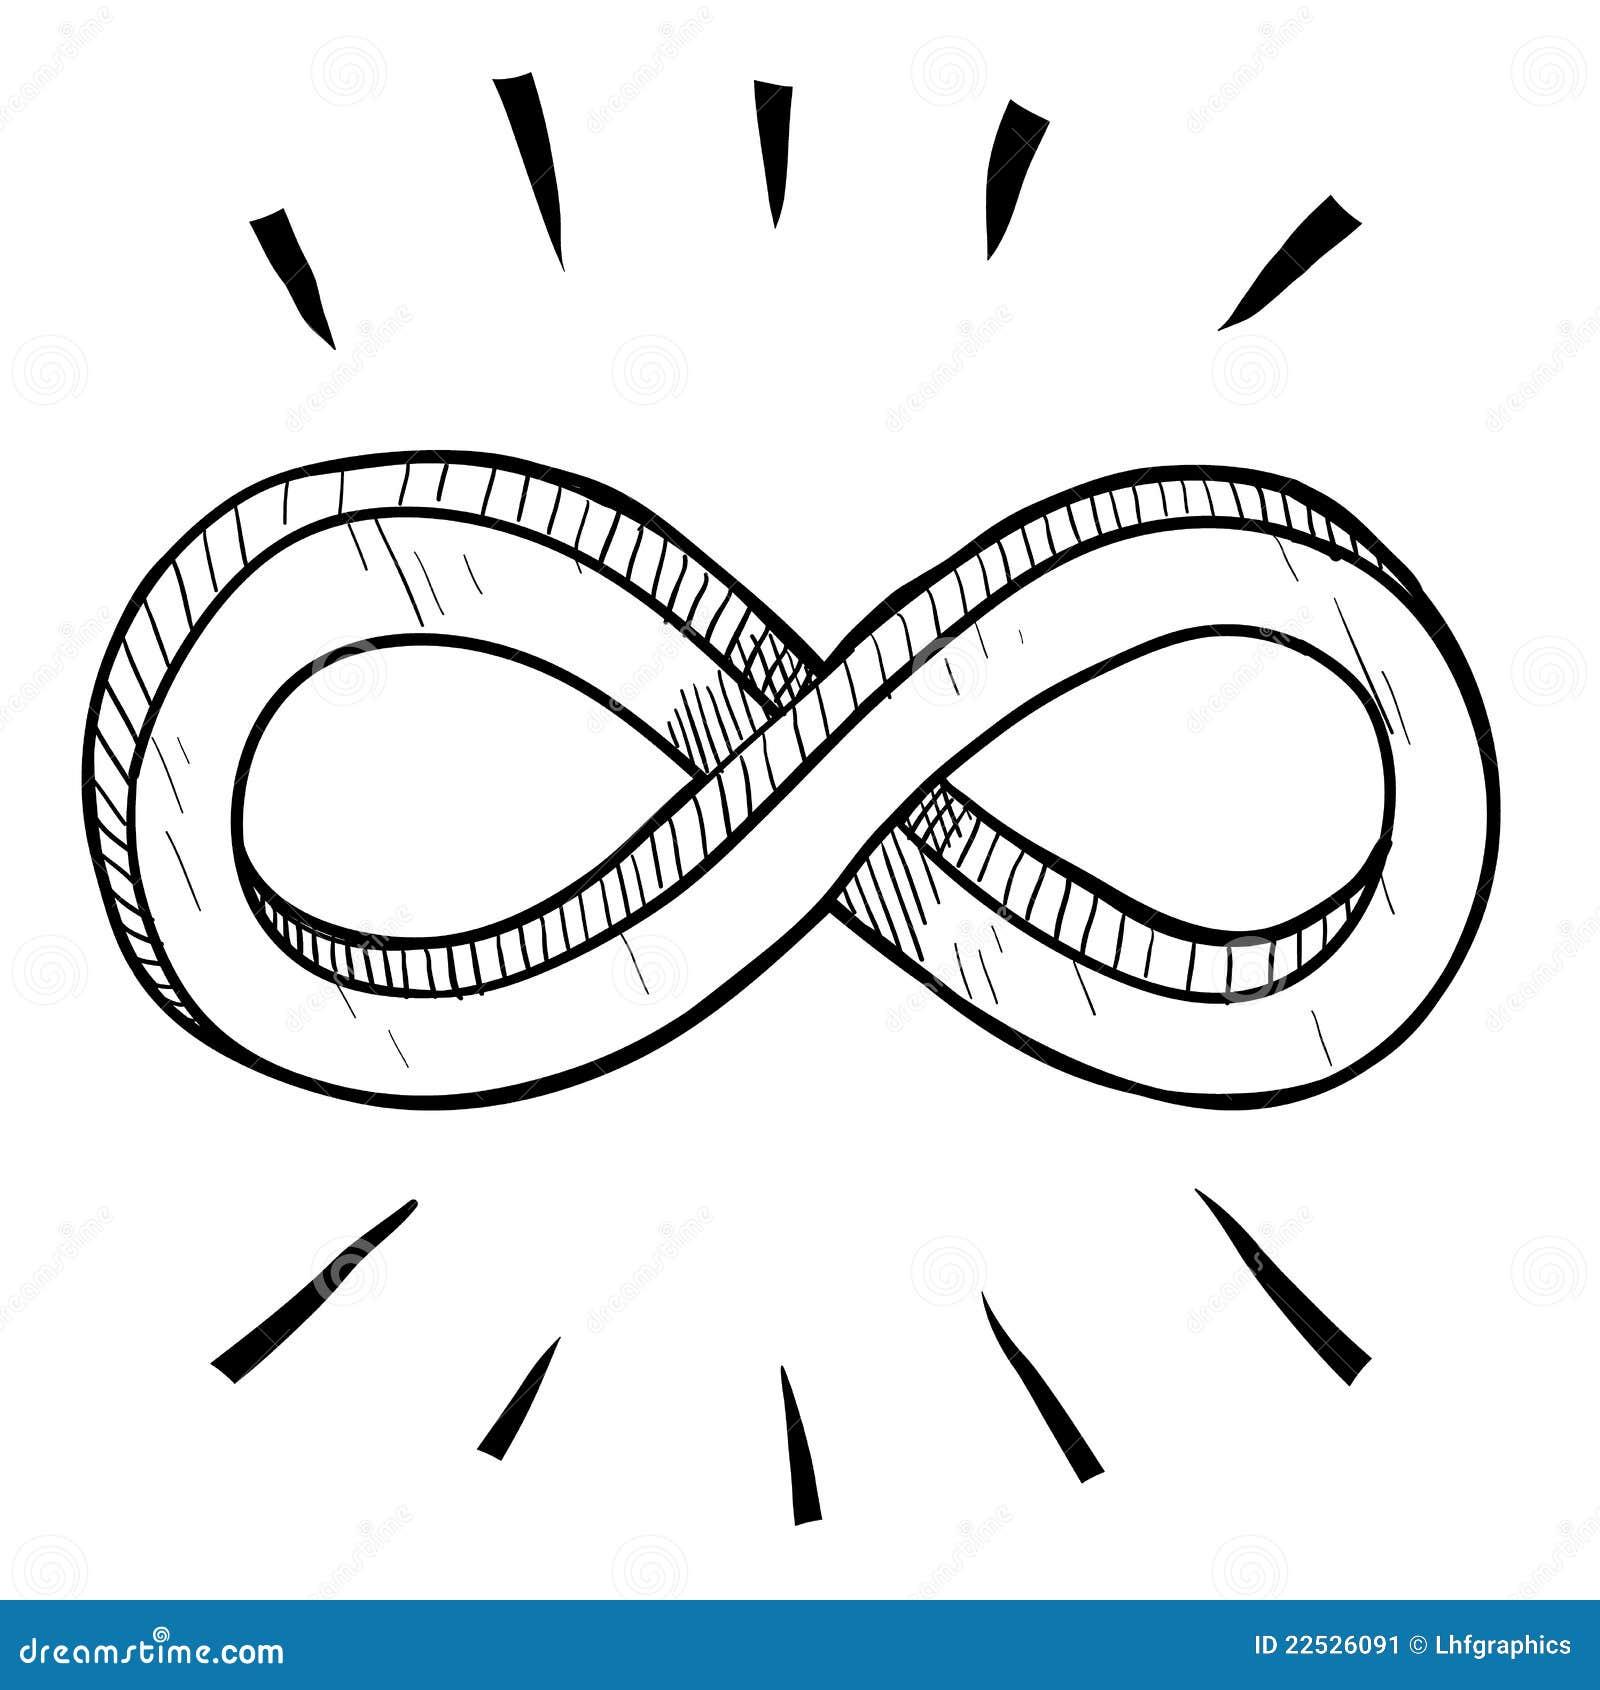 Infiniti Mathp Infinity Mirror Youtube Infinity Maths Physics